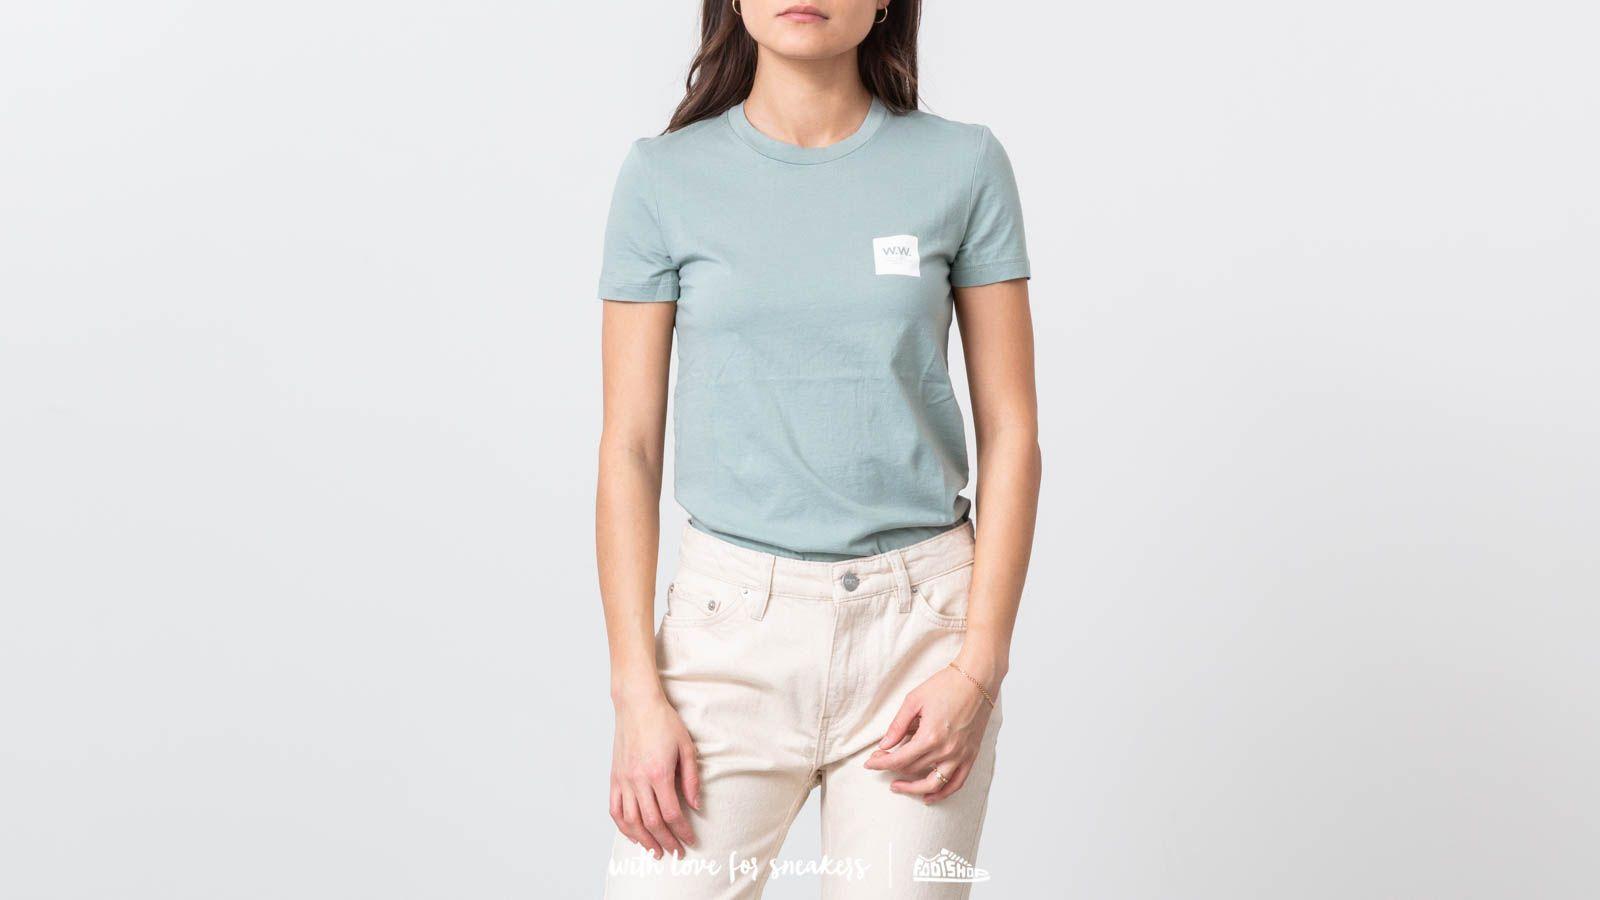 Camisetas WOOD WOOD Eden Tee Mint